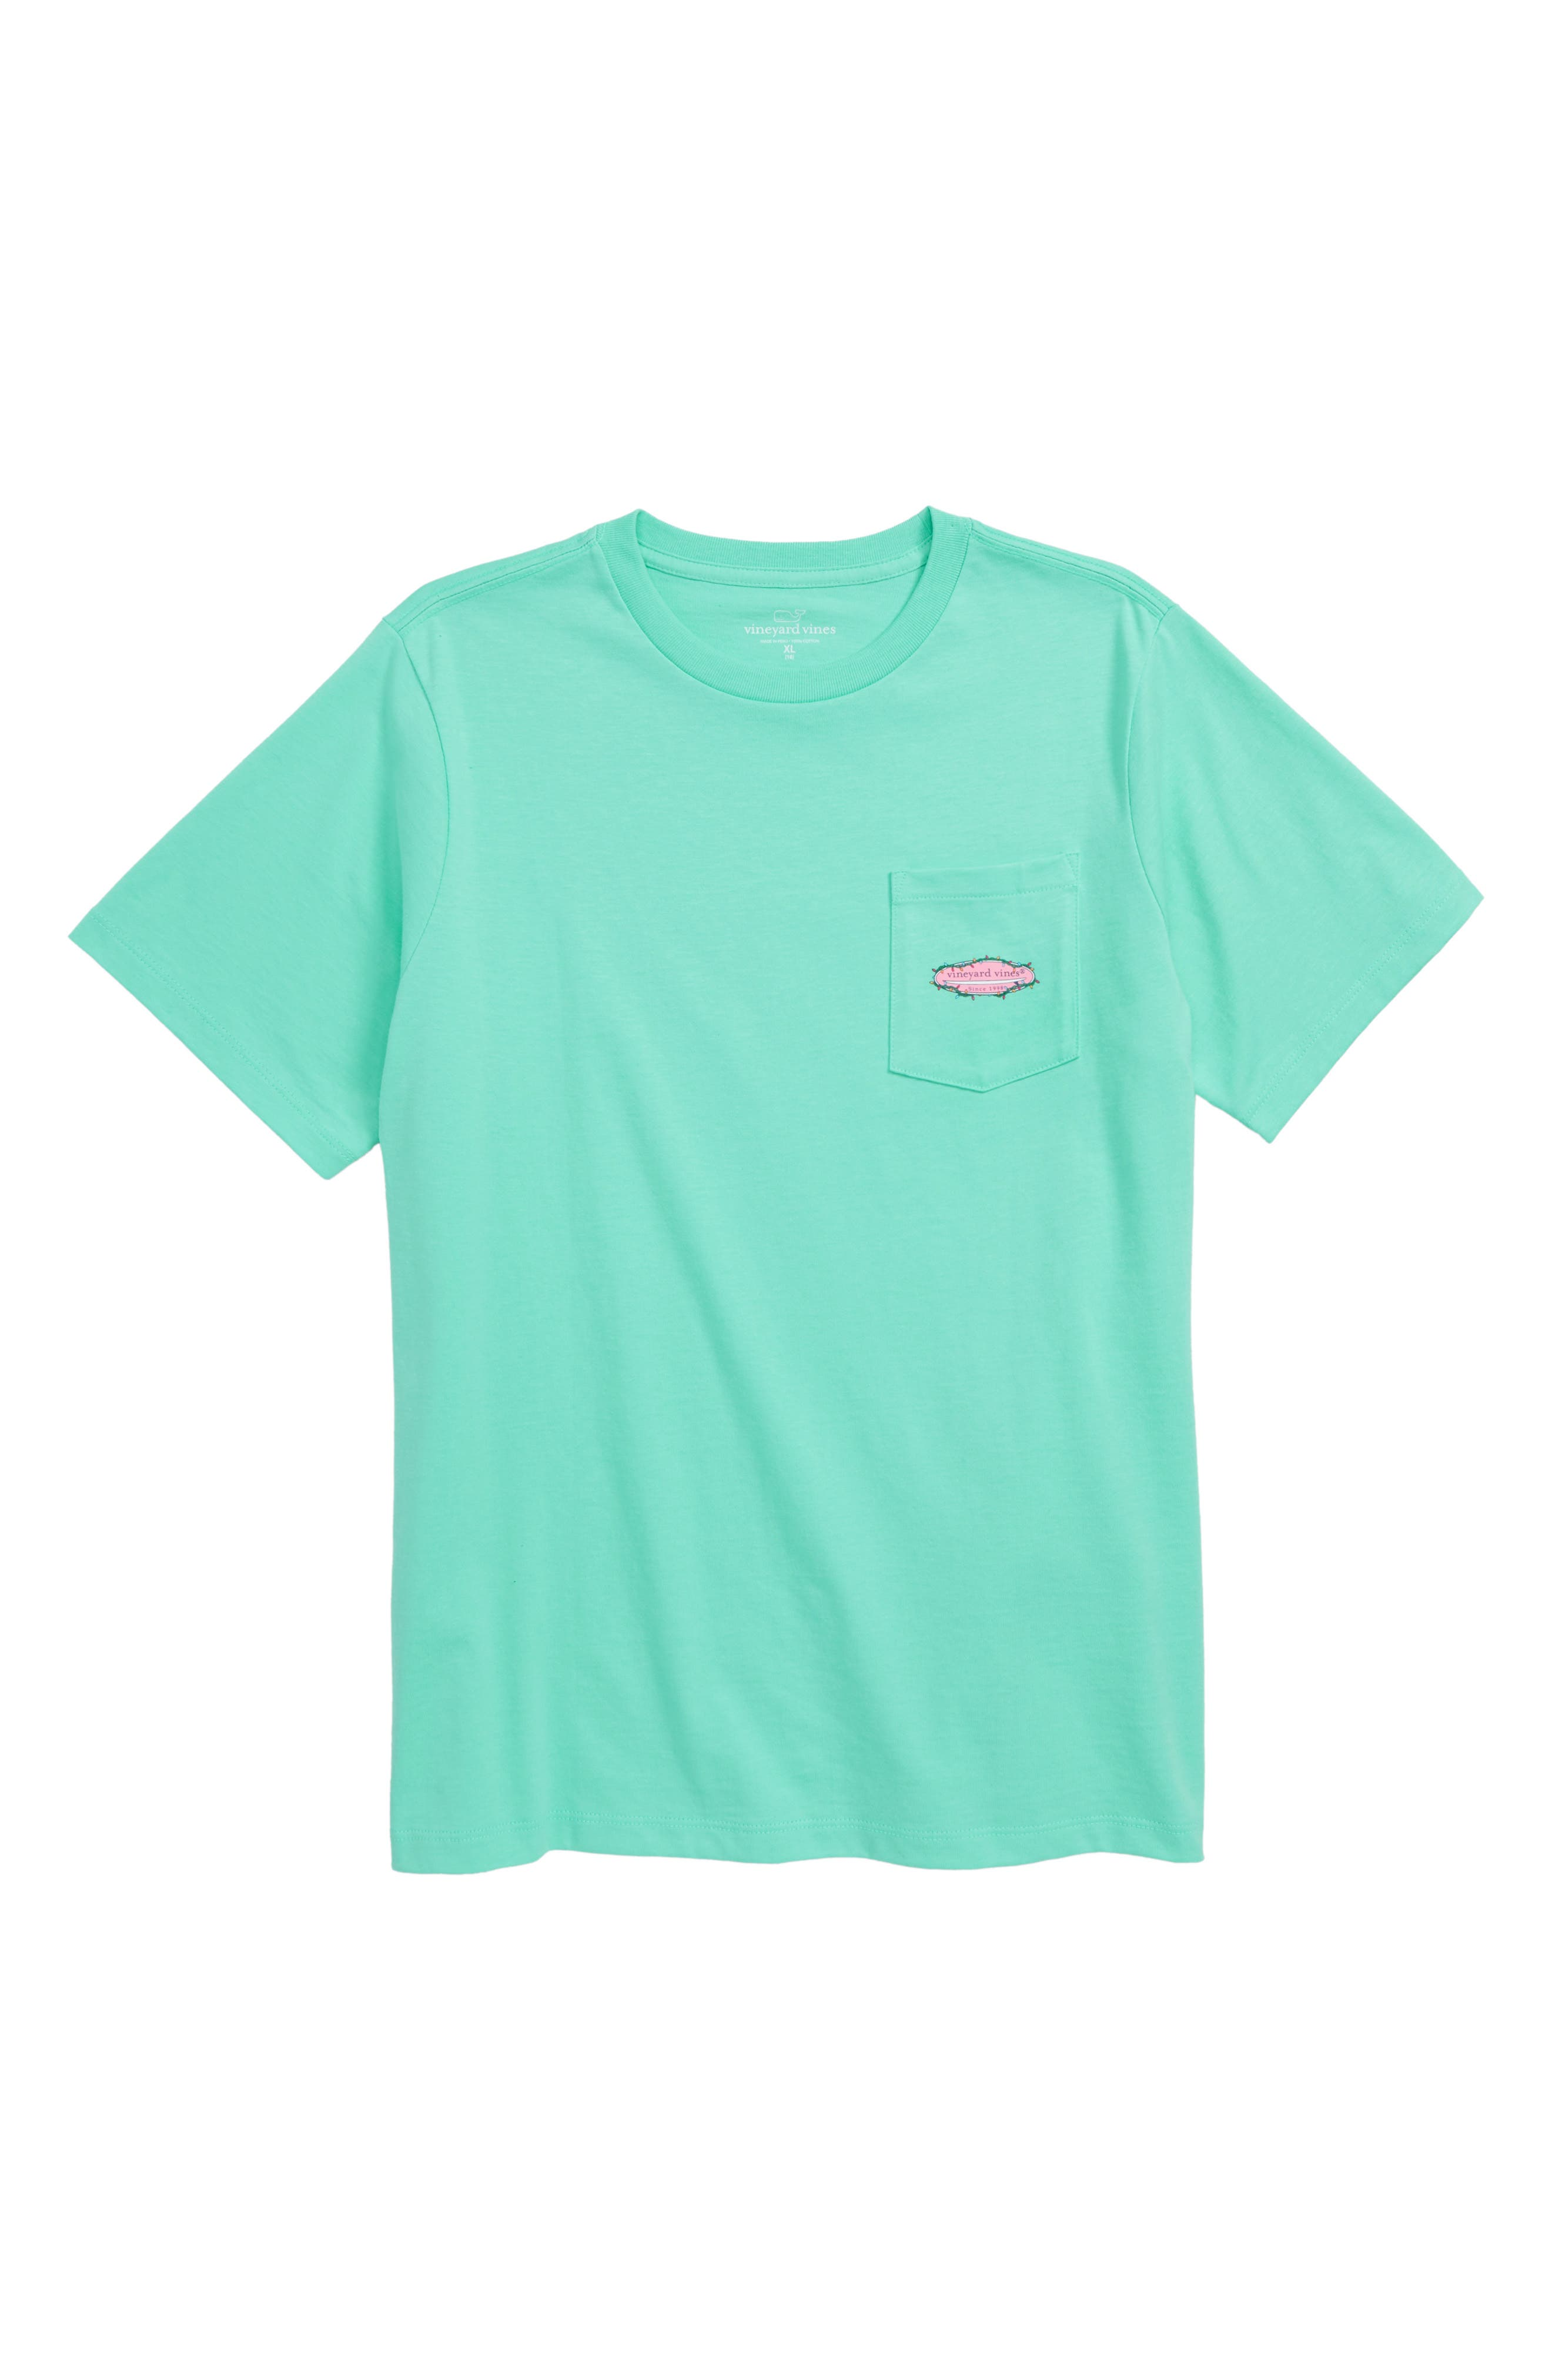 Surf Lights T-Shirt,                         Main,                         color, CAPRI BLUE